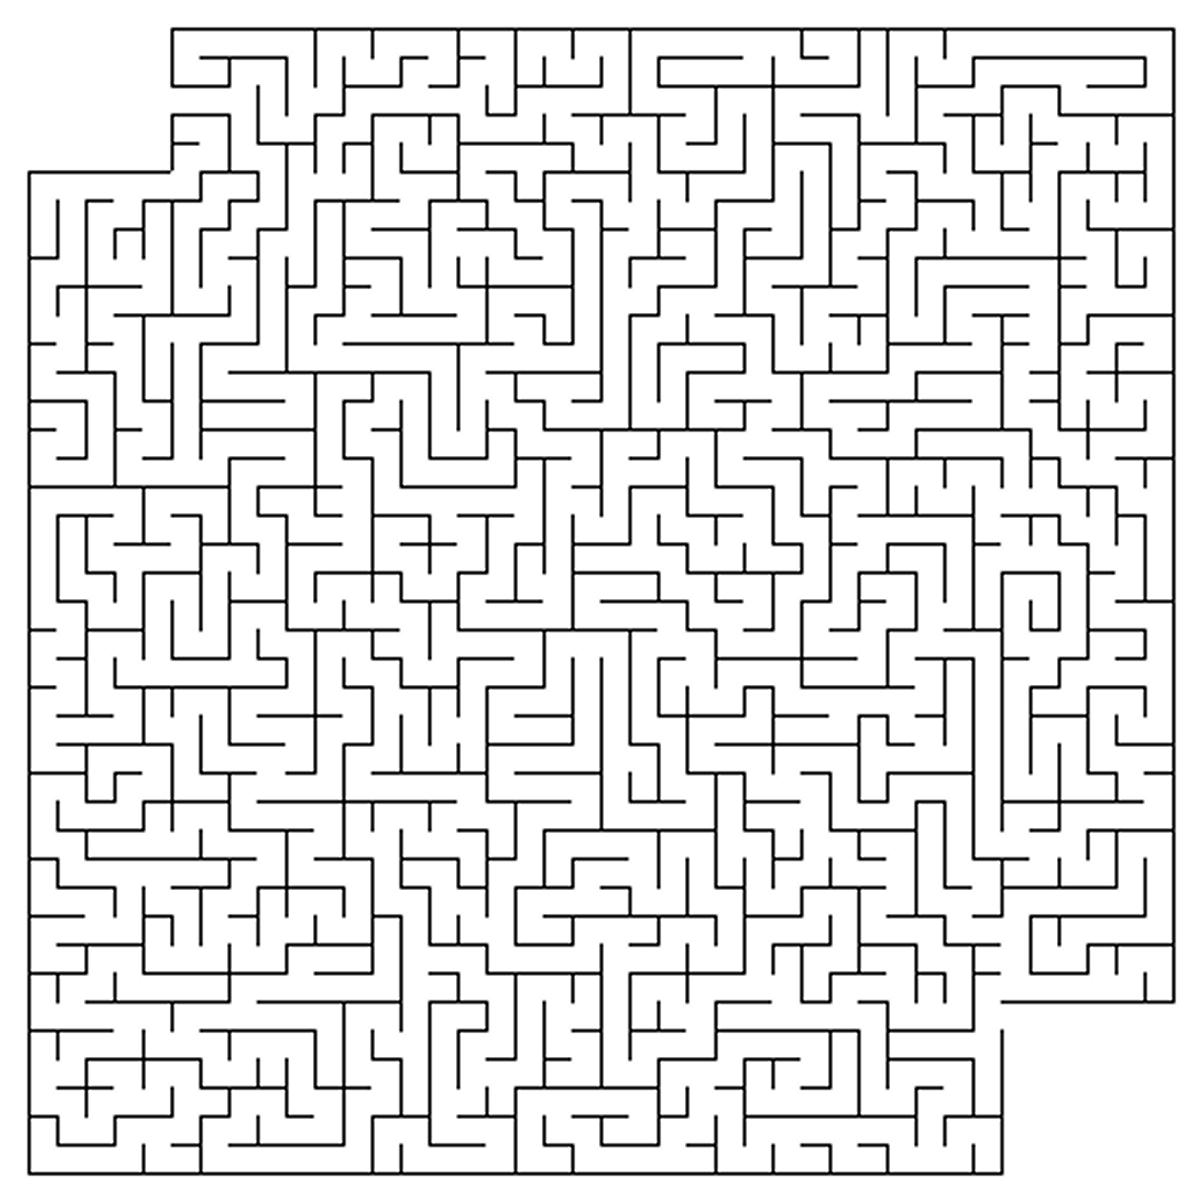 Sinterklaas Kleurplaat Bovenbouw Pin By Катя Осинская On Maze Labyrinth 2 Лабиринт Азбука